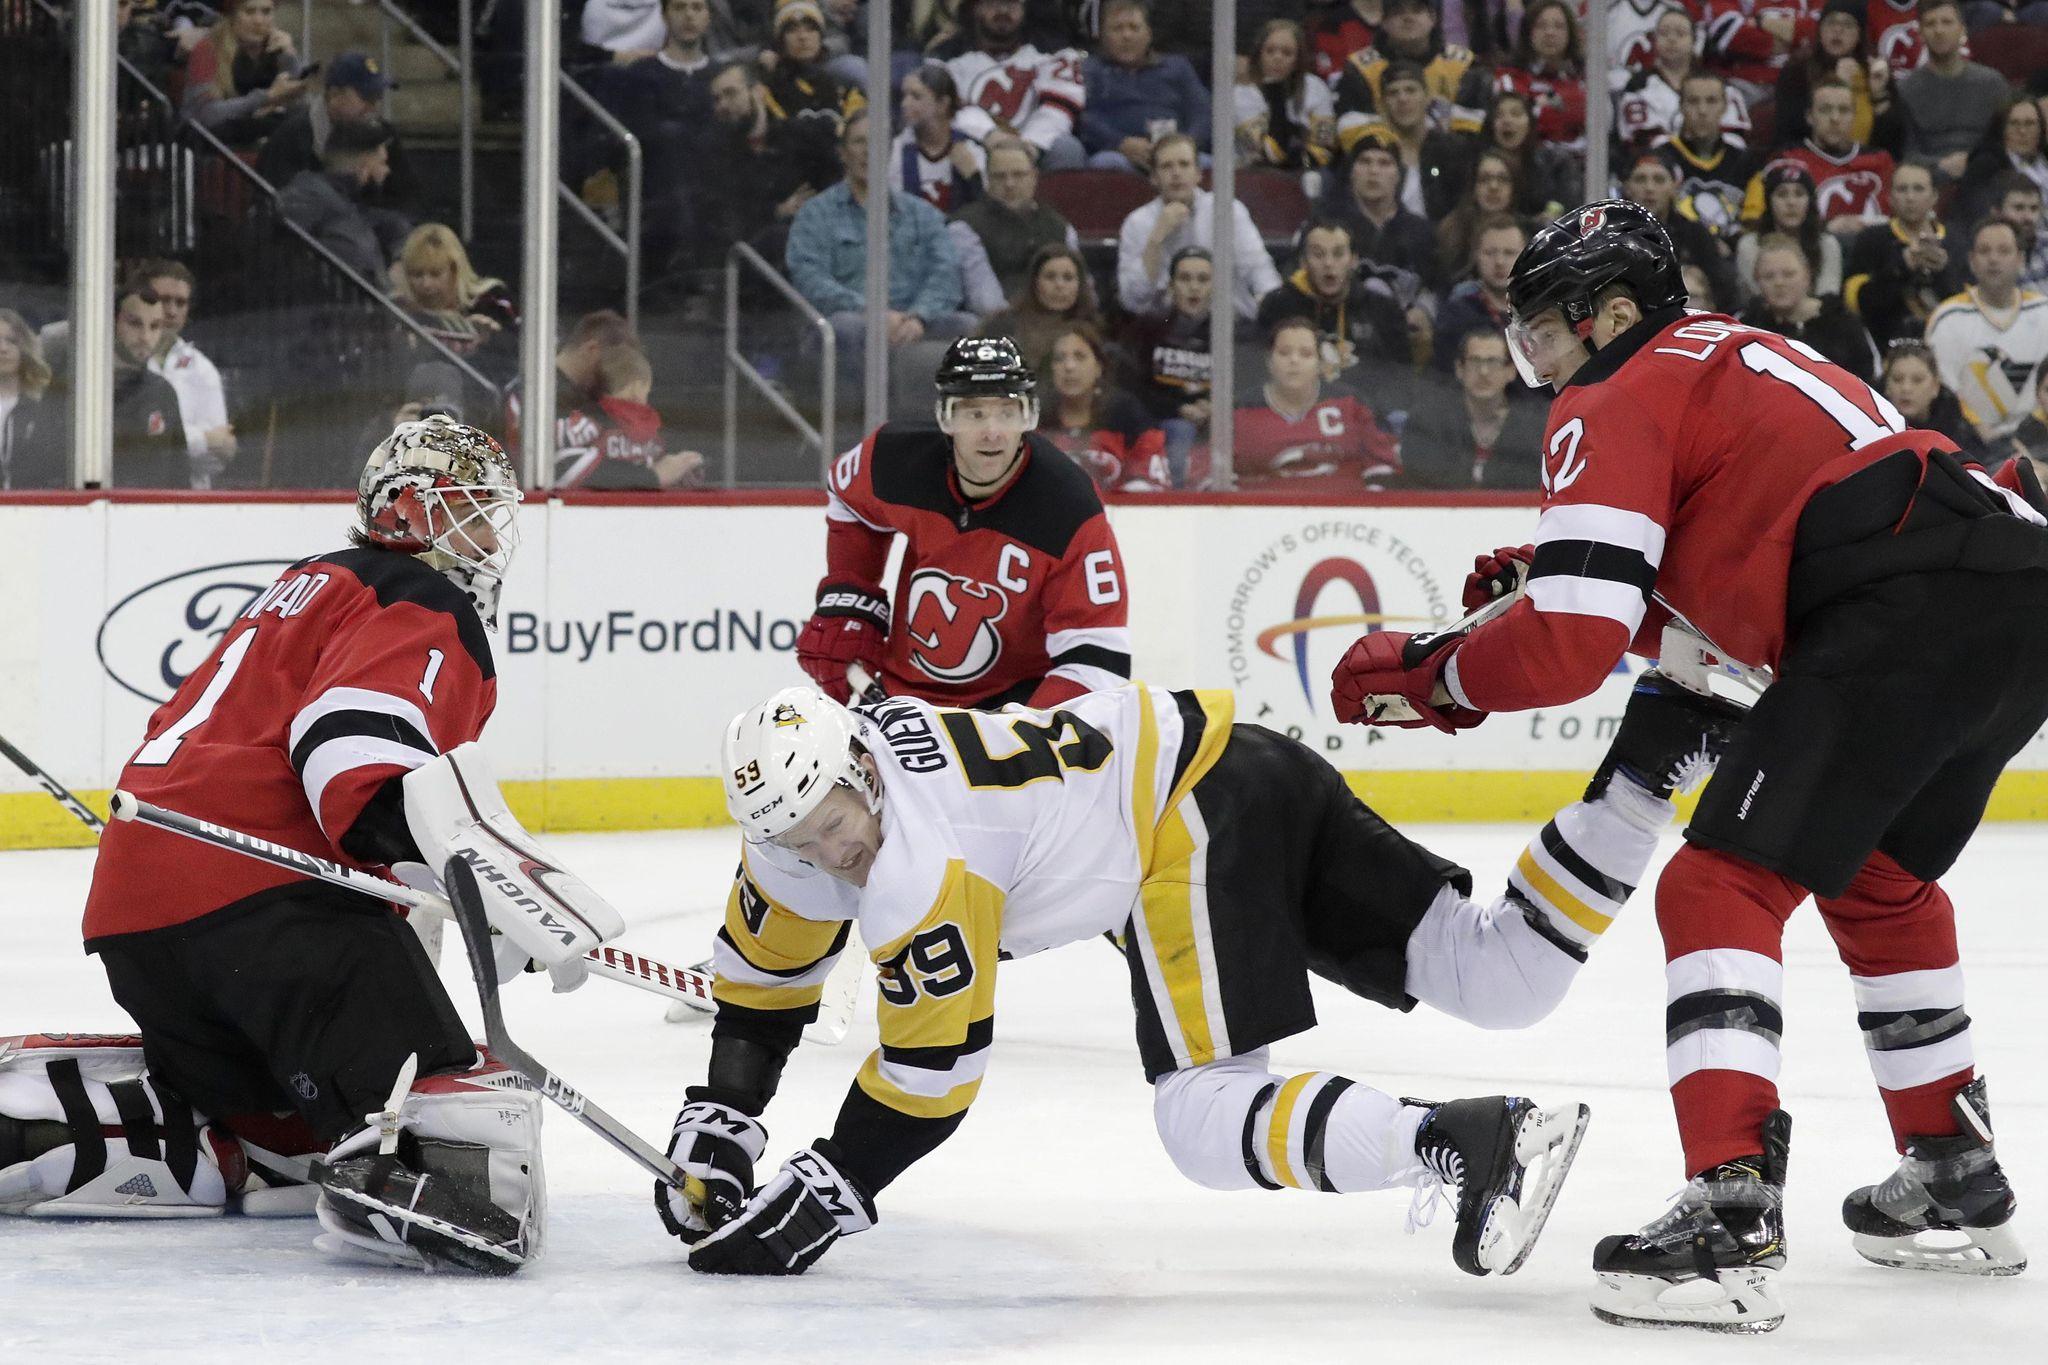 Penguins_devils_hockey_52528_s2048x1365